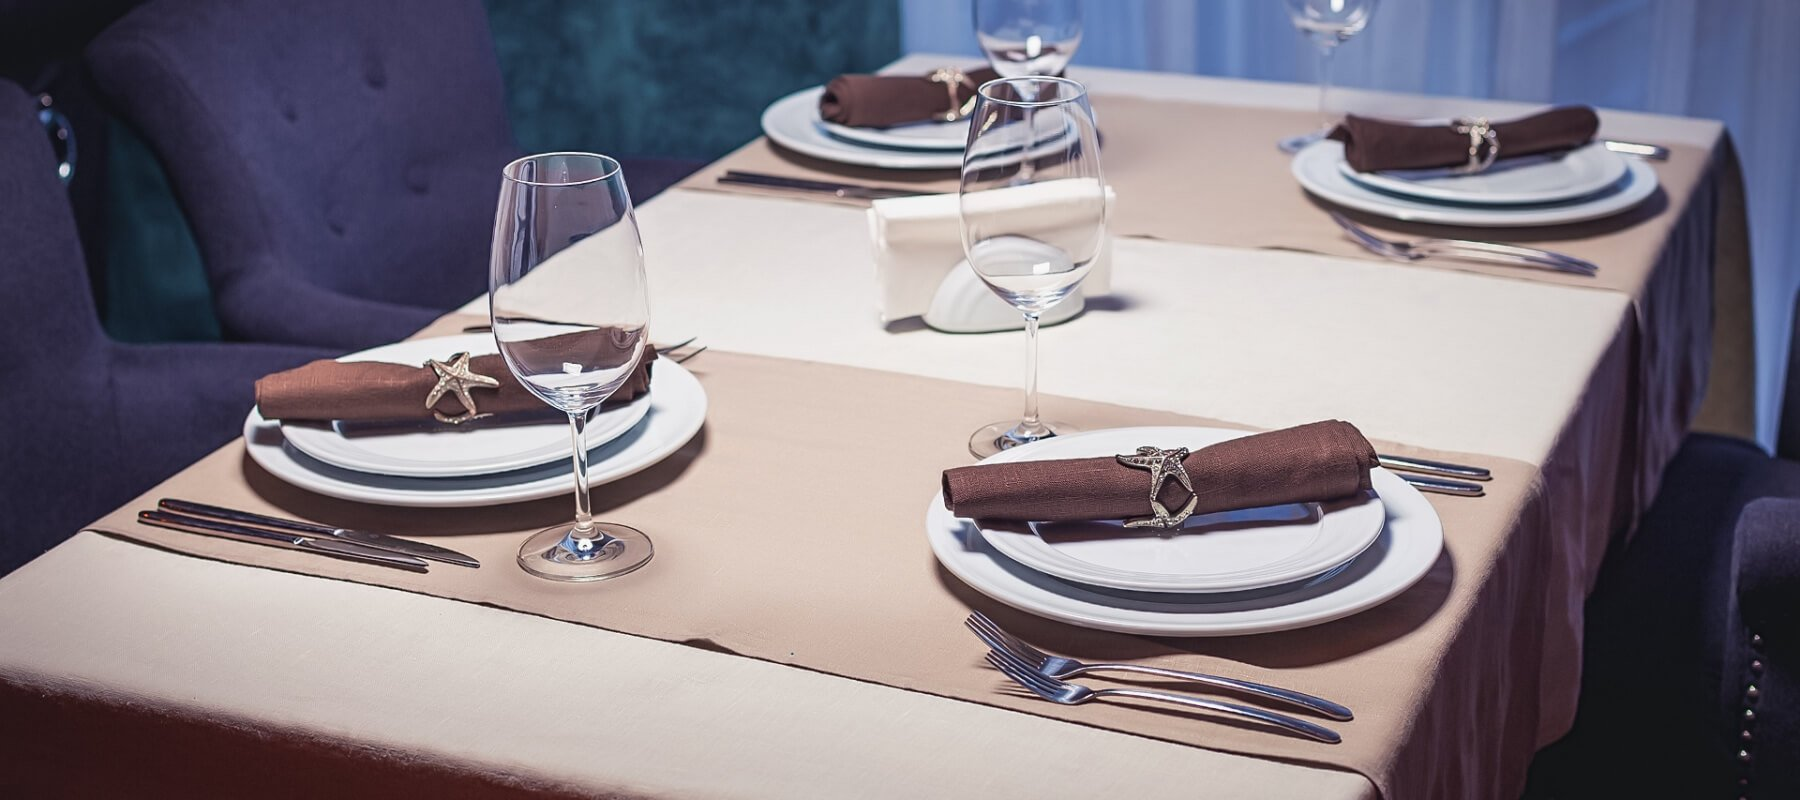 Ресторан гостиницы maristella-resident